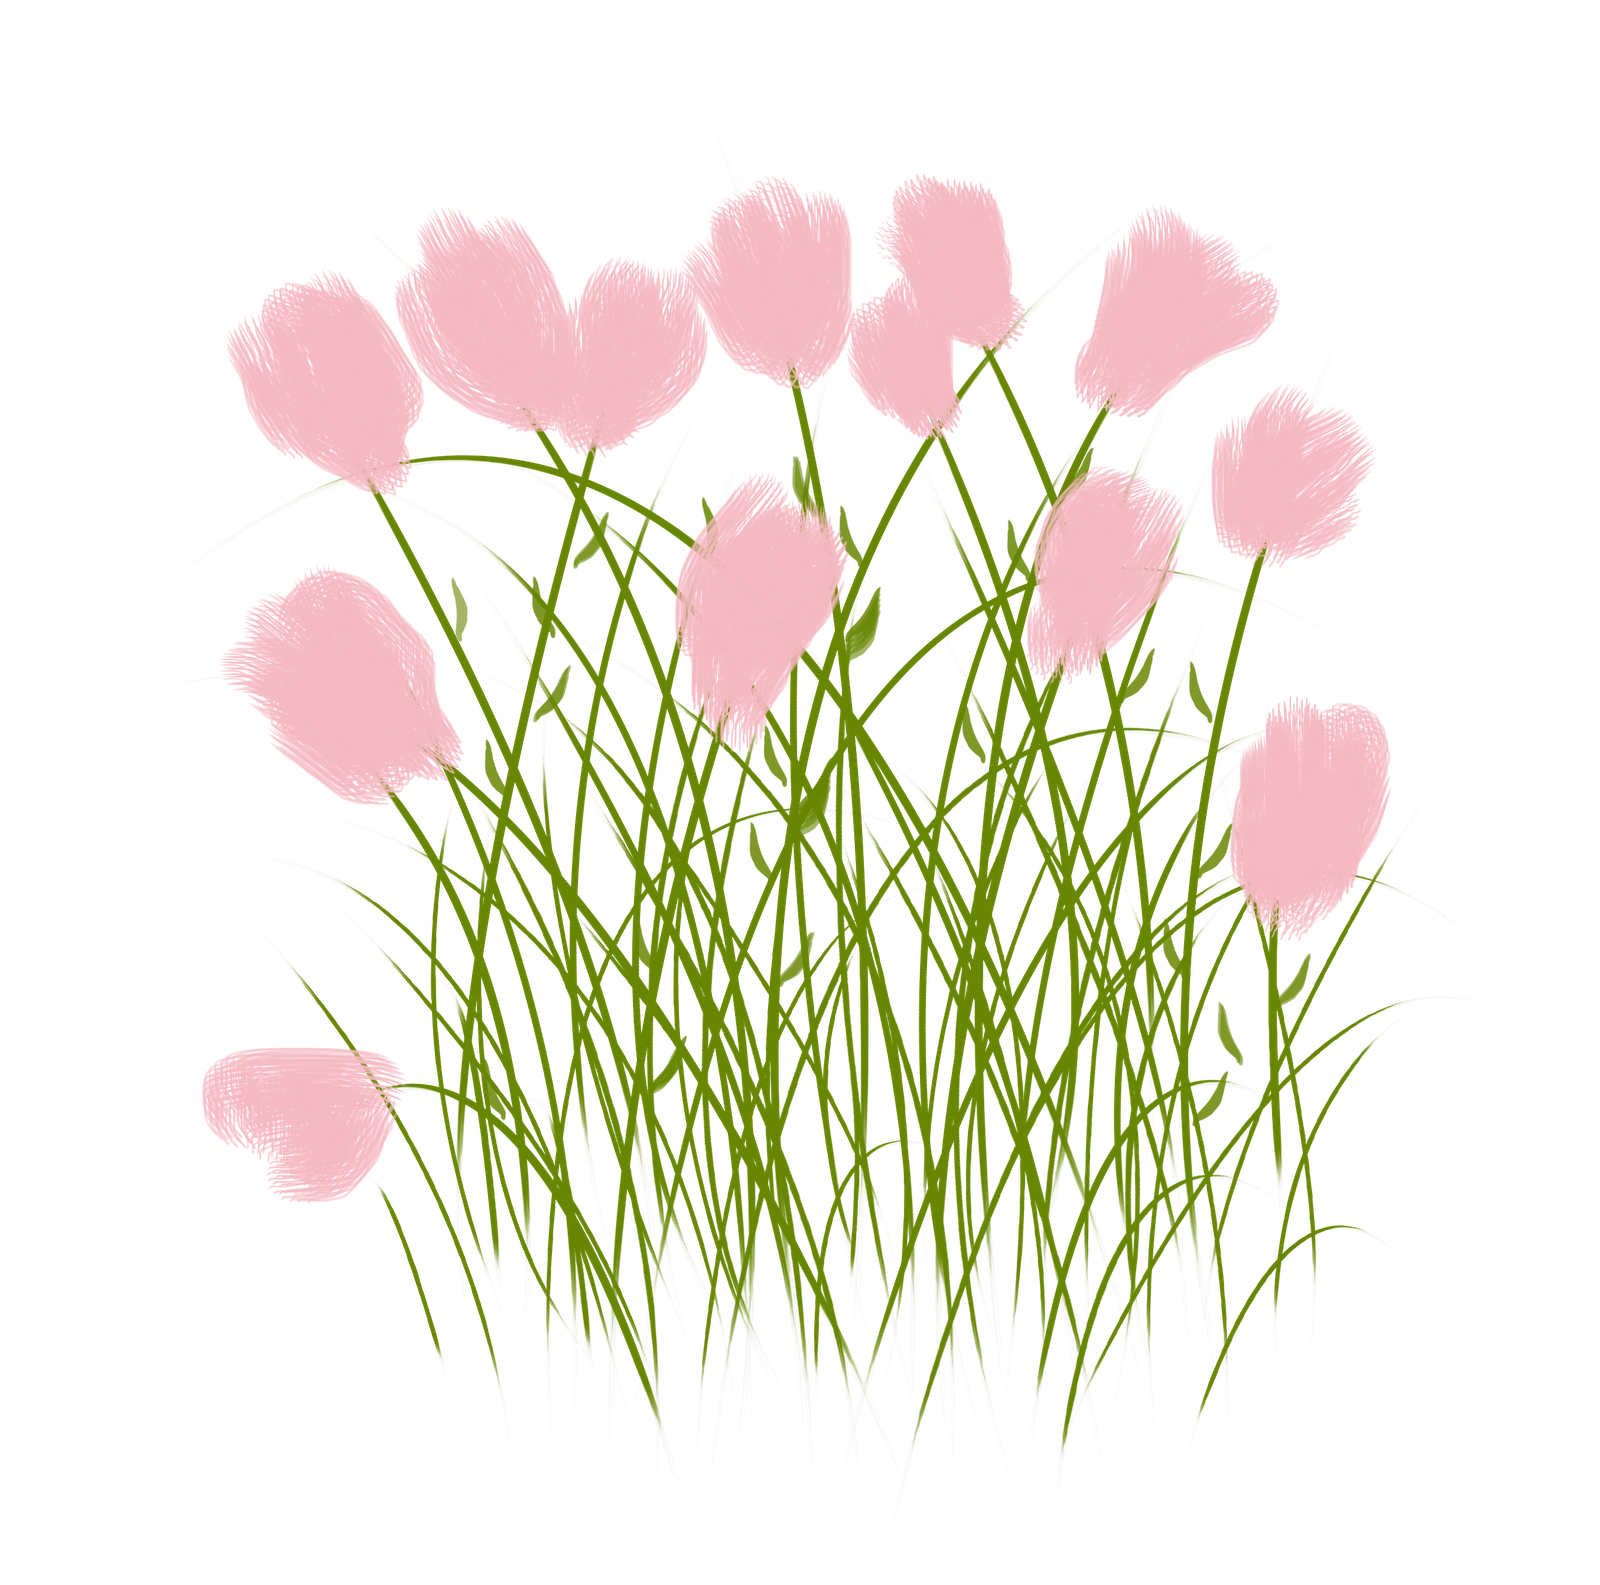 GENIUS KIDS ZONE: Pokok Bunga Menjalar